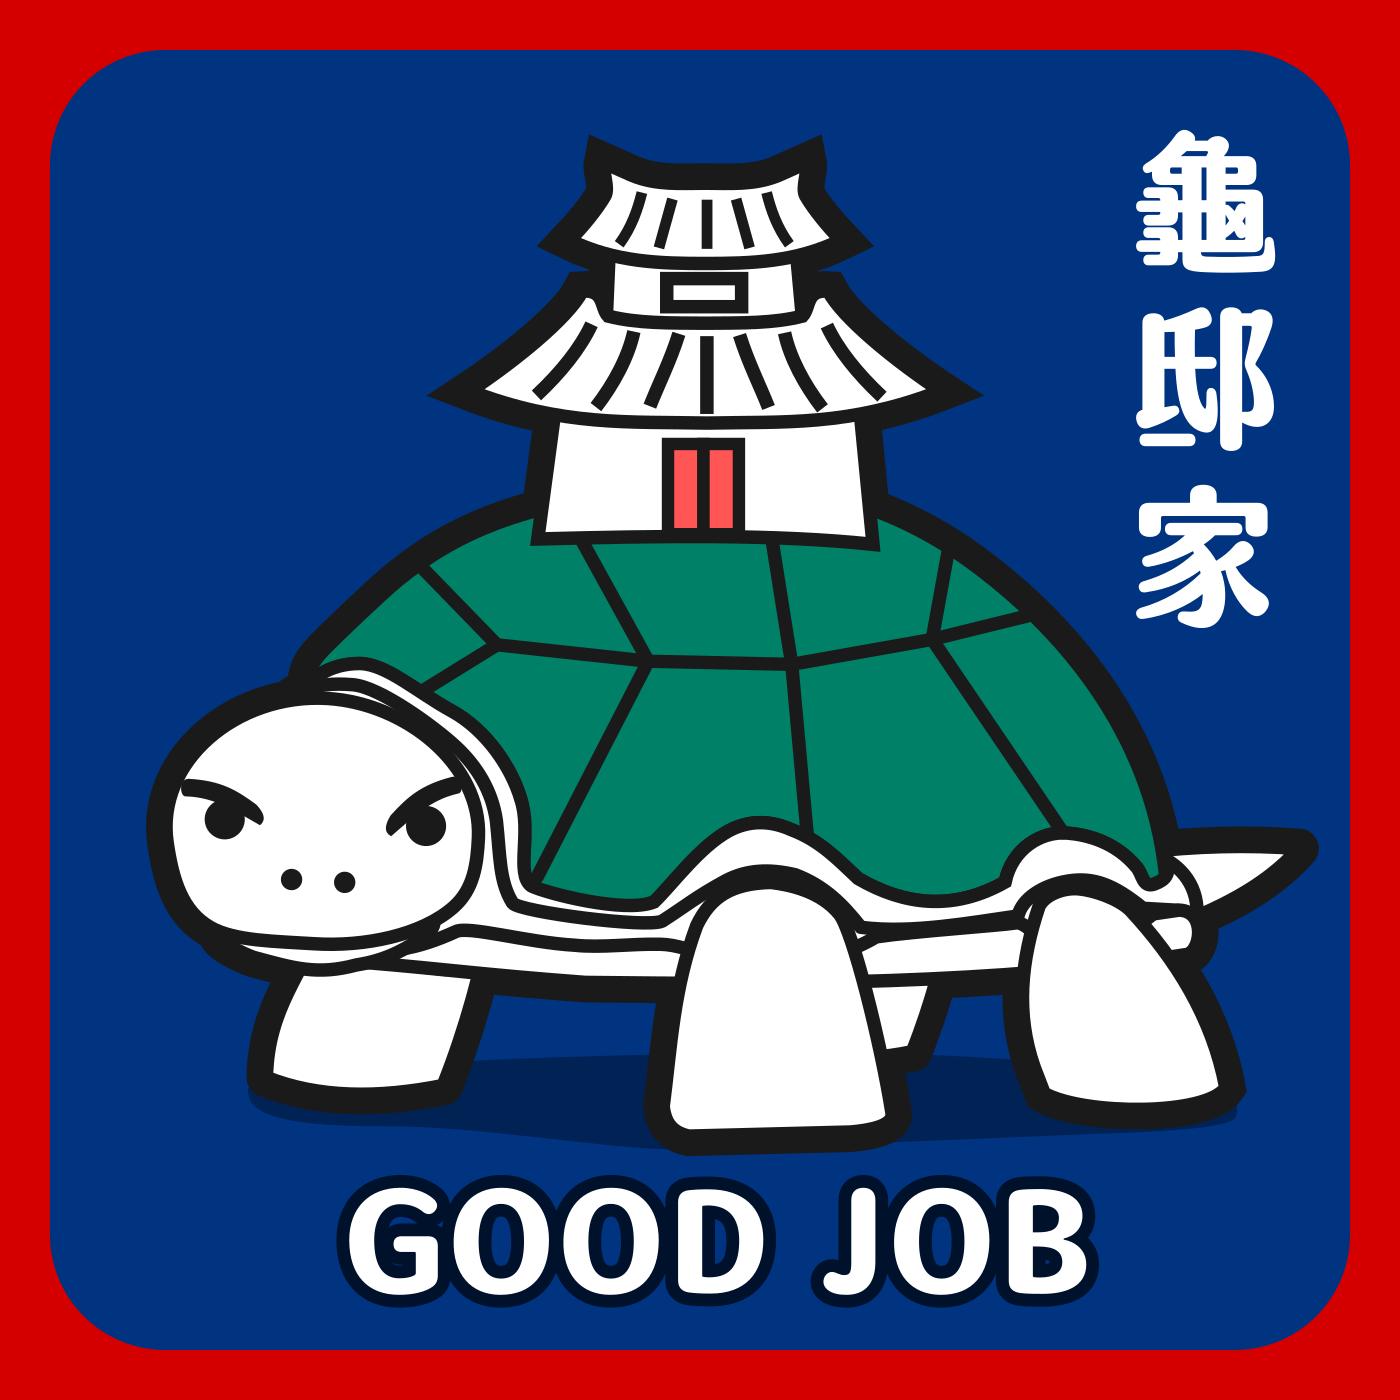 EP11-[放暗棍;台灣小學生表現愛的方式;收棍抓魚幫家人加菜;賣魚賺零用錢;唯一的財富自由要買糖果餅乾]